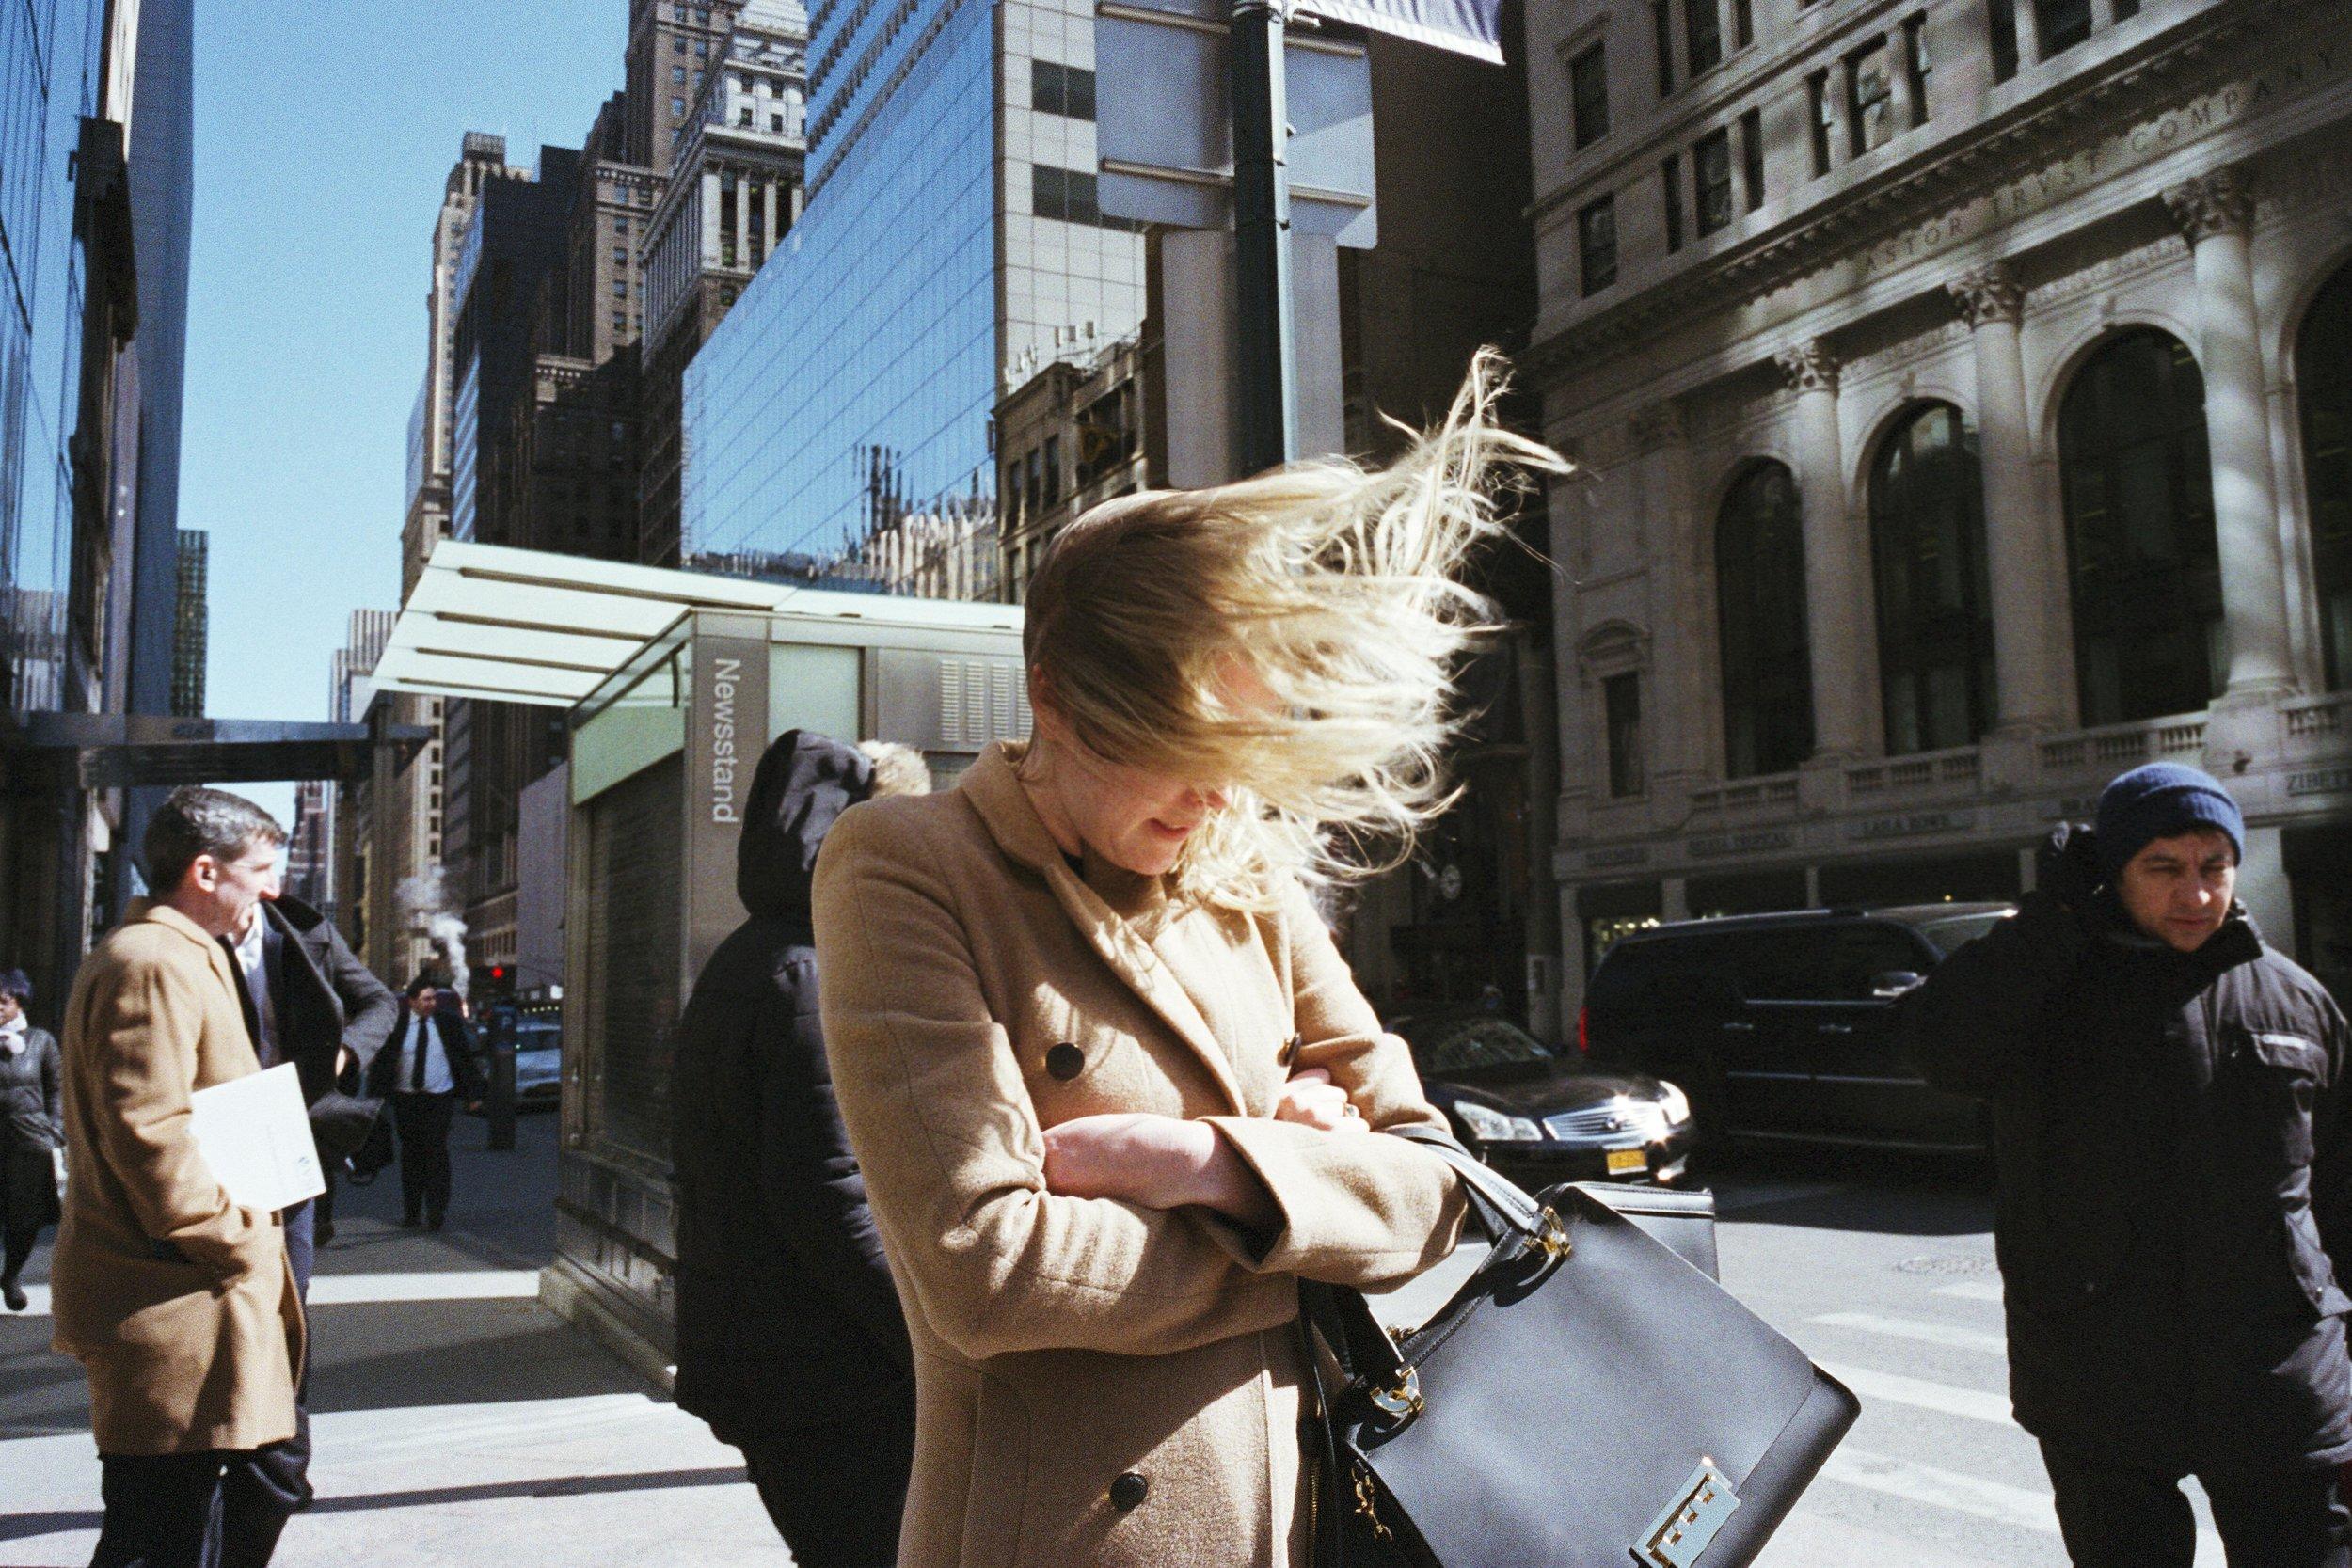 hair_wind_33712331812_o.jpg